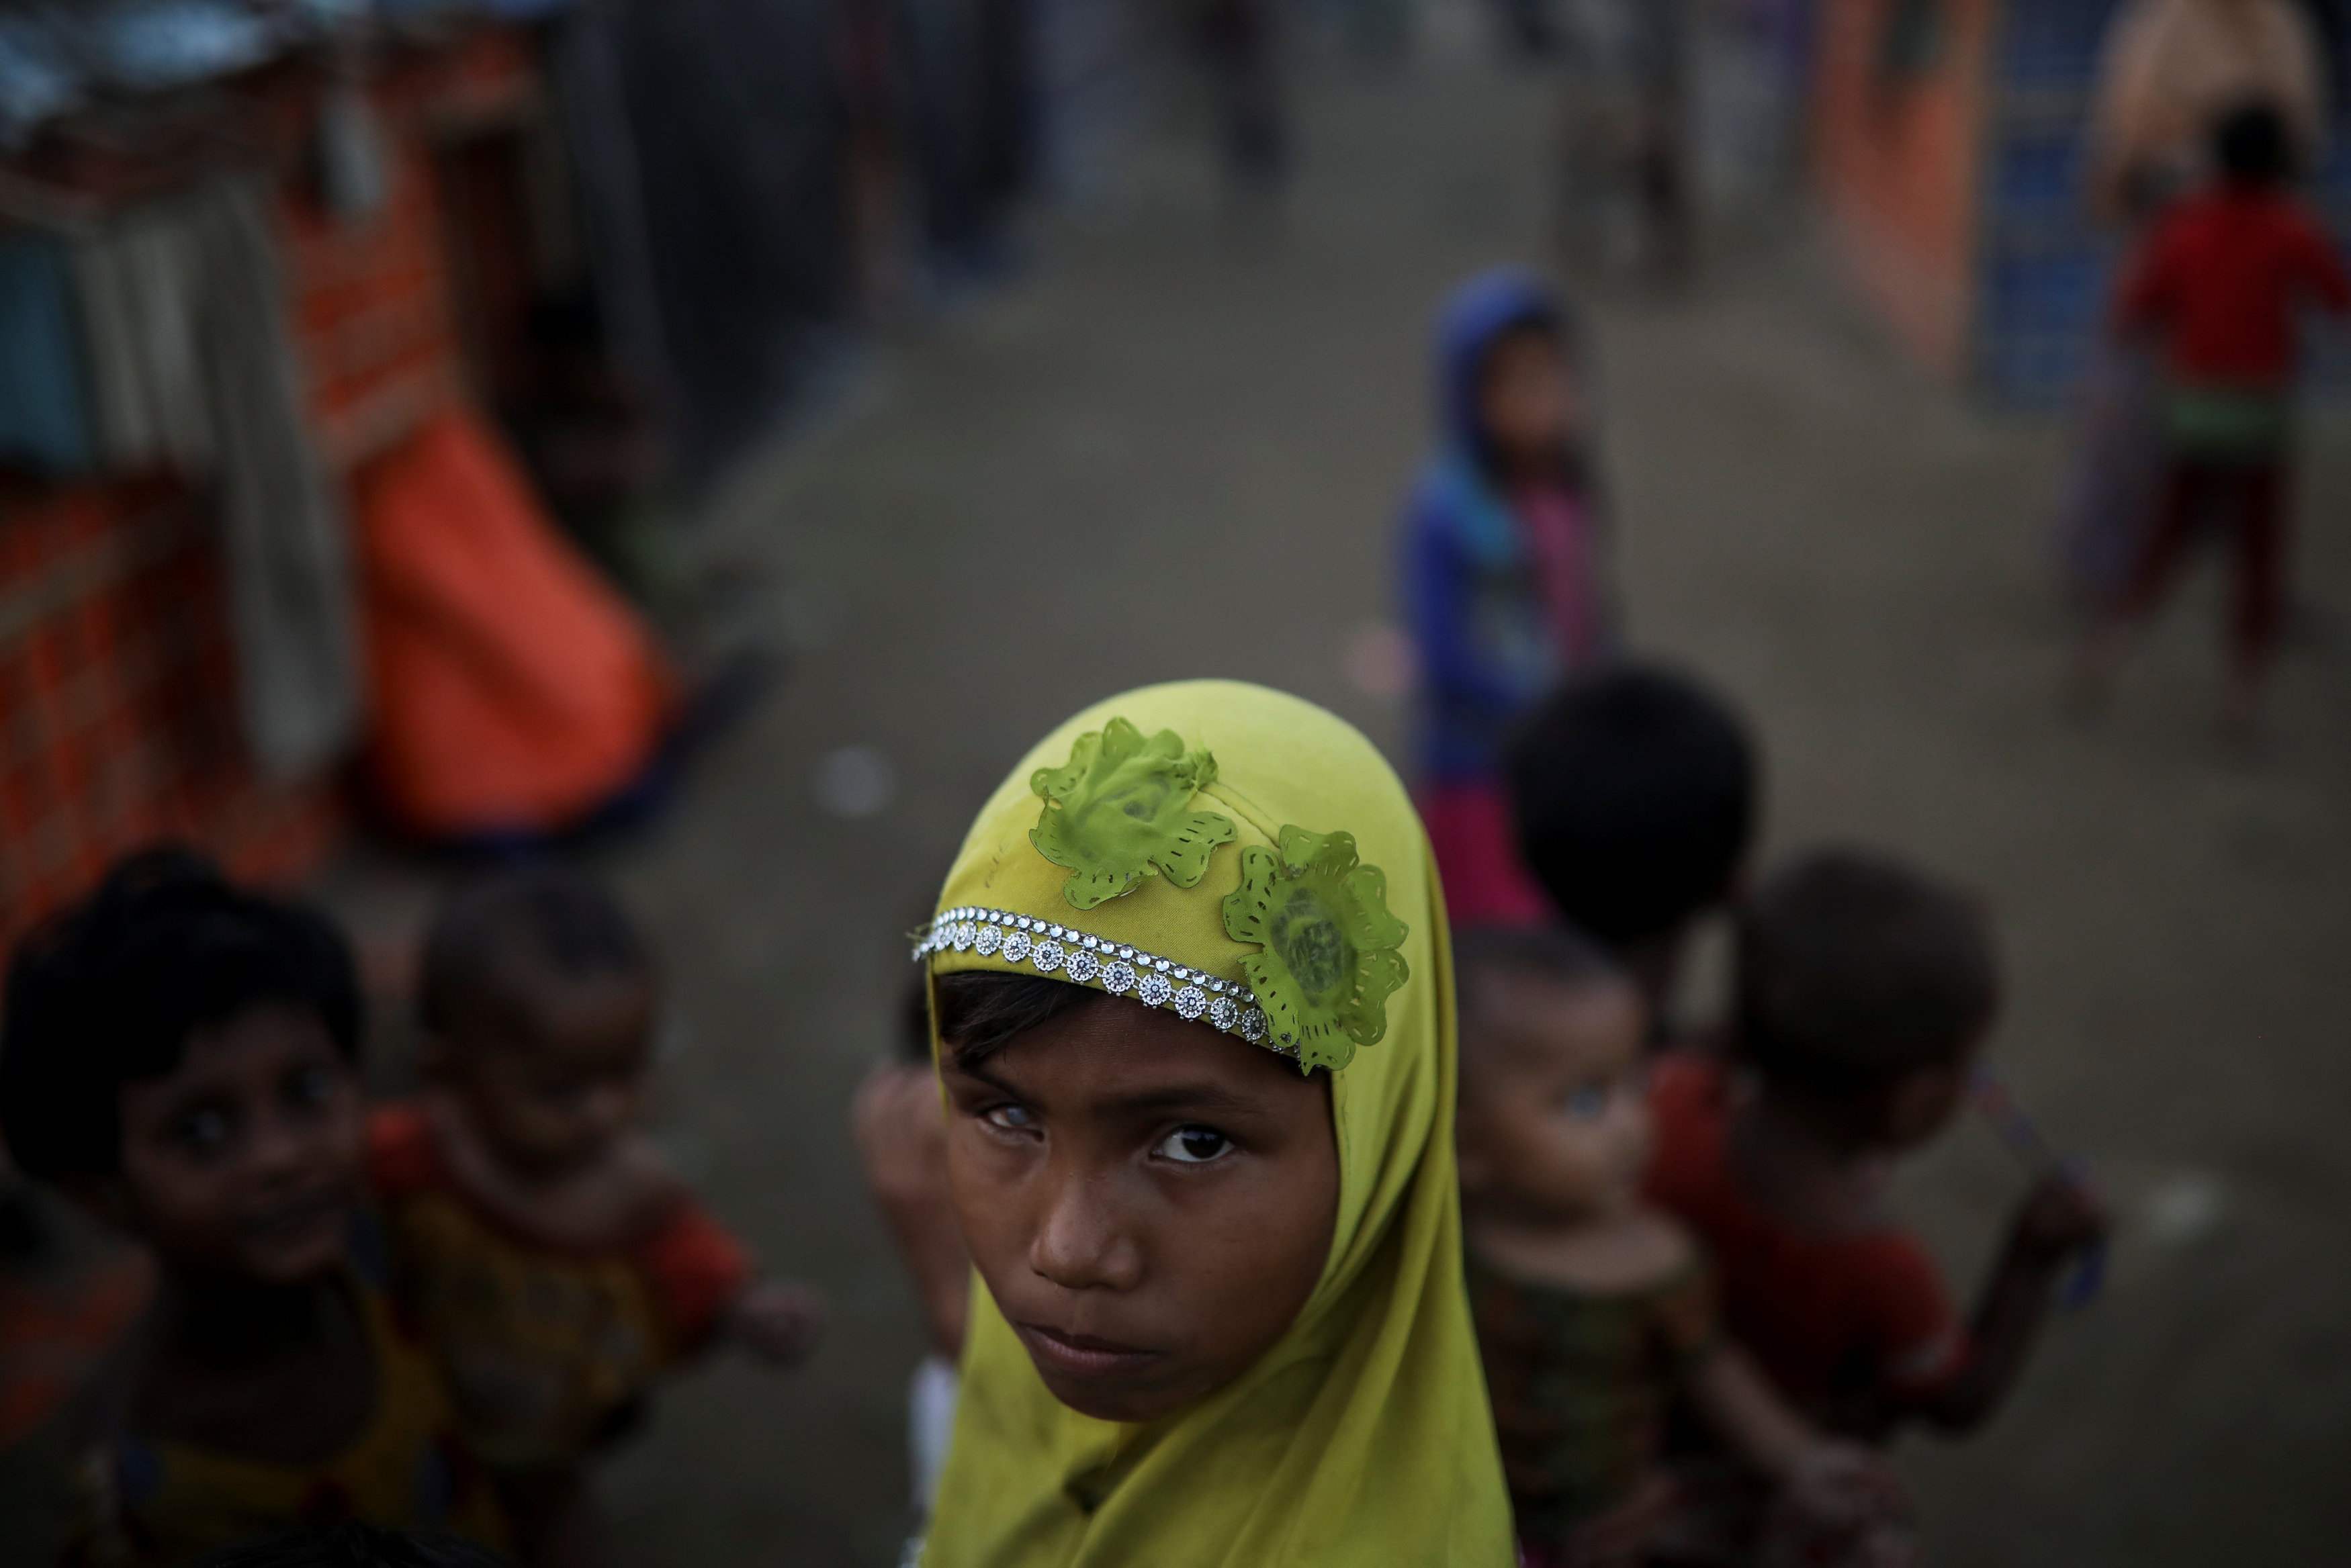 Rohingya refugee children play at the Shamlapur refugee camp near Cox's Bazar, Bangladesh December 20, 2017. REUTERS/Marko Djurica